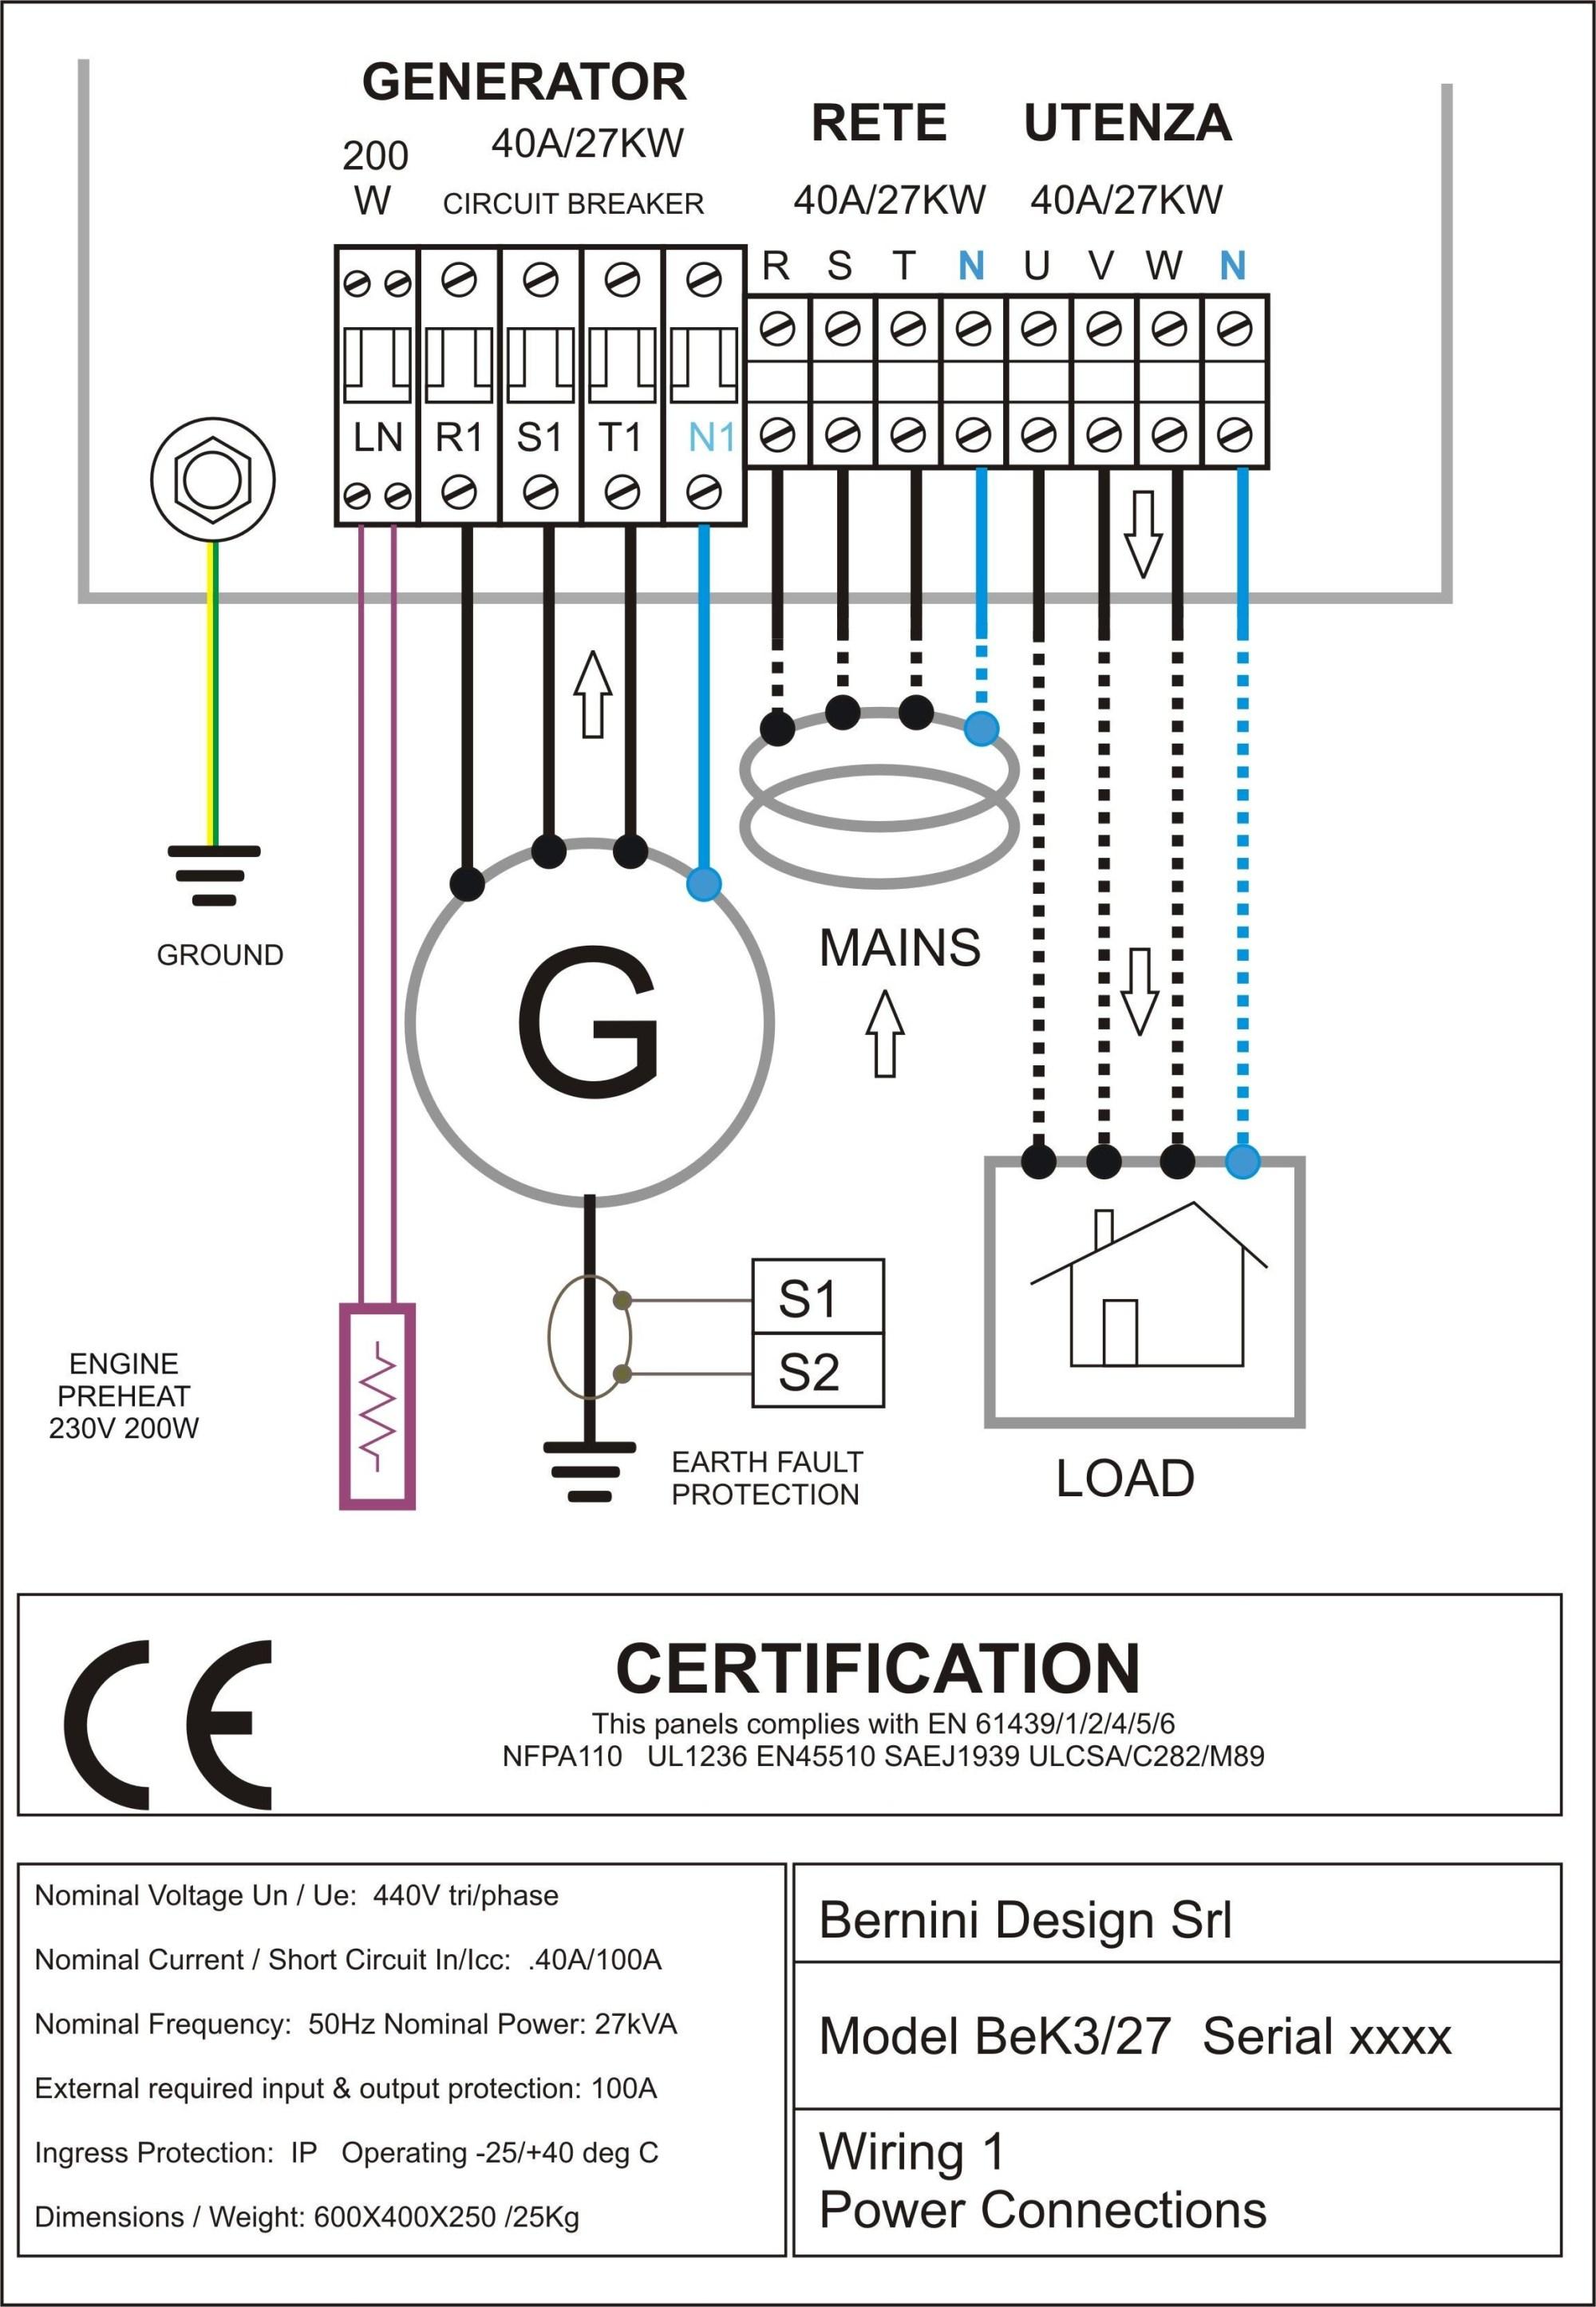 hight resolution of cummins diesel engine diagram sel generator control panel wiring diagram ac connections of cummins diesel engine cummins diesel engine diagram 1998 dodge